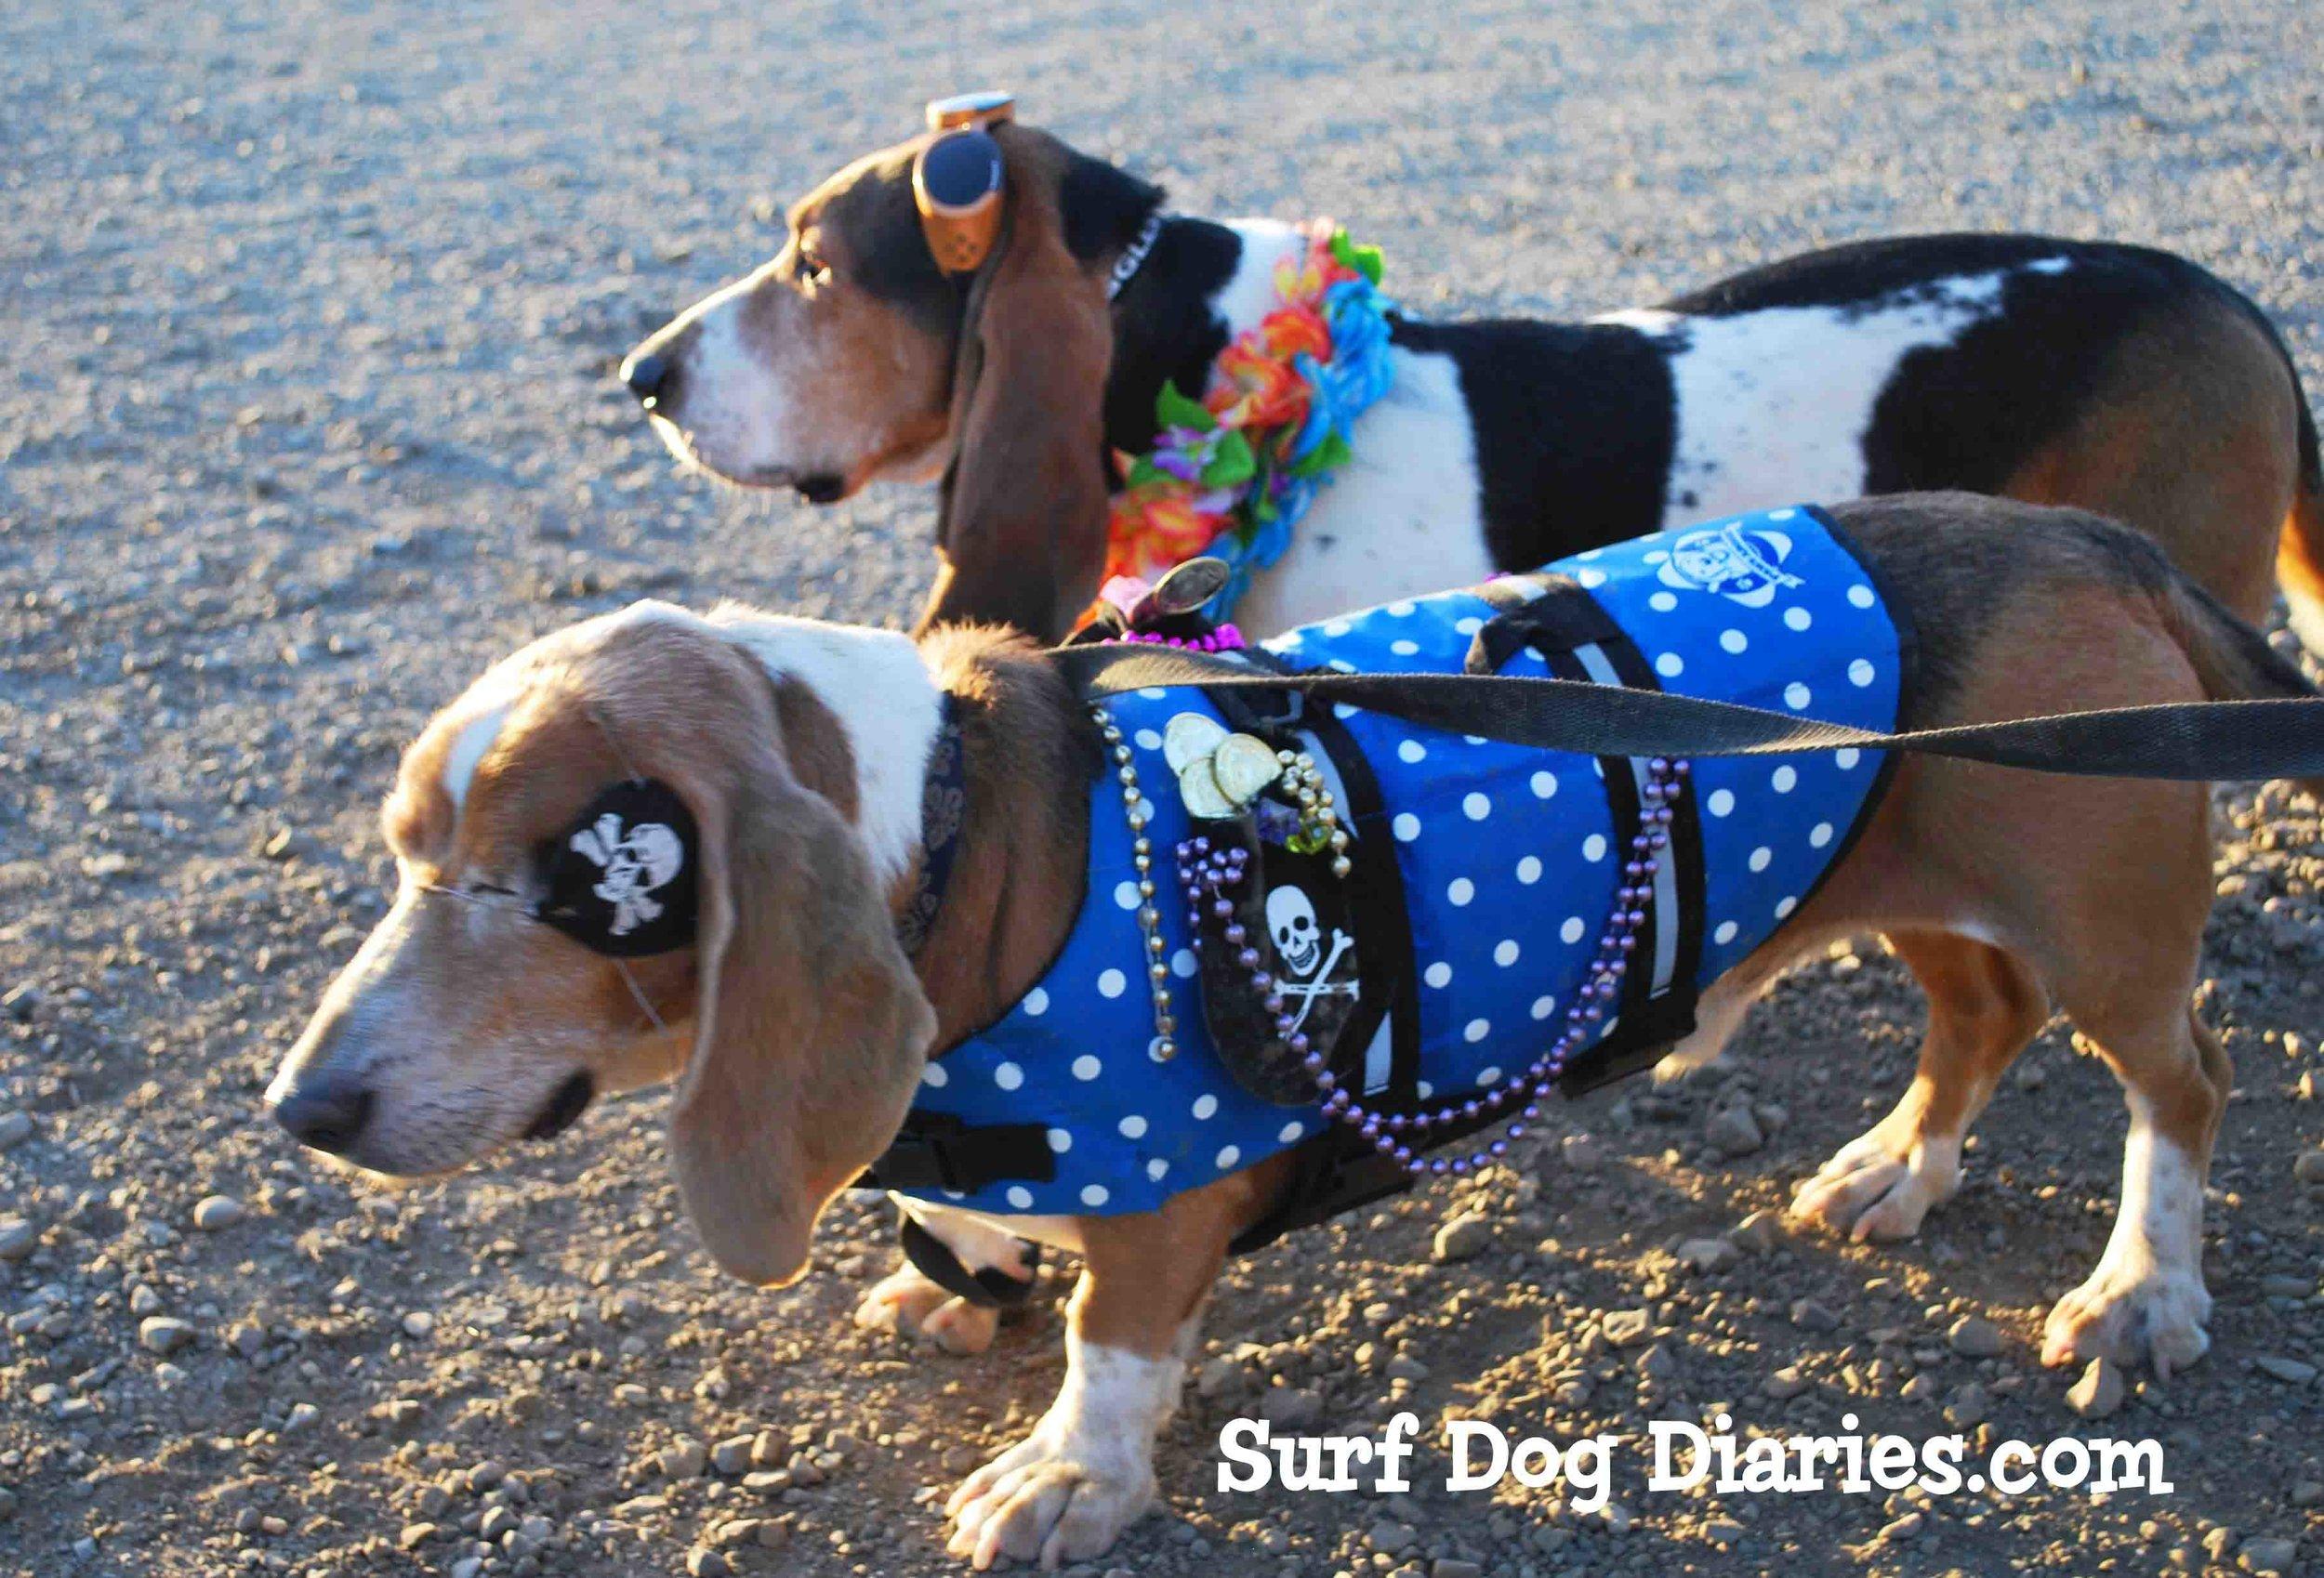 Elvis Dude 2 shot -Surf Dog Diaries Graphic_edited-2.jpg